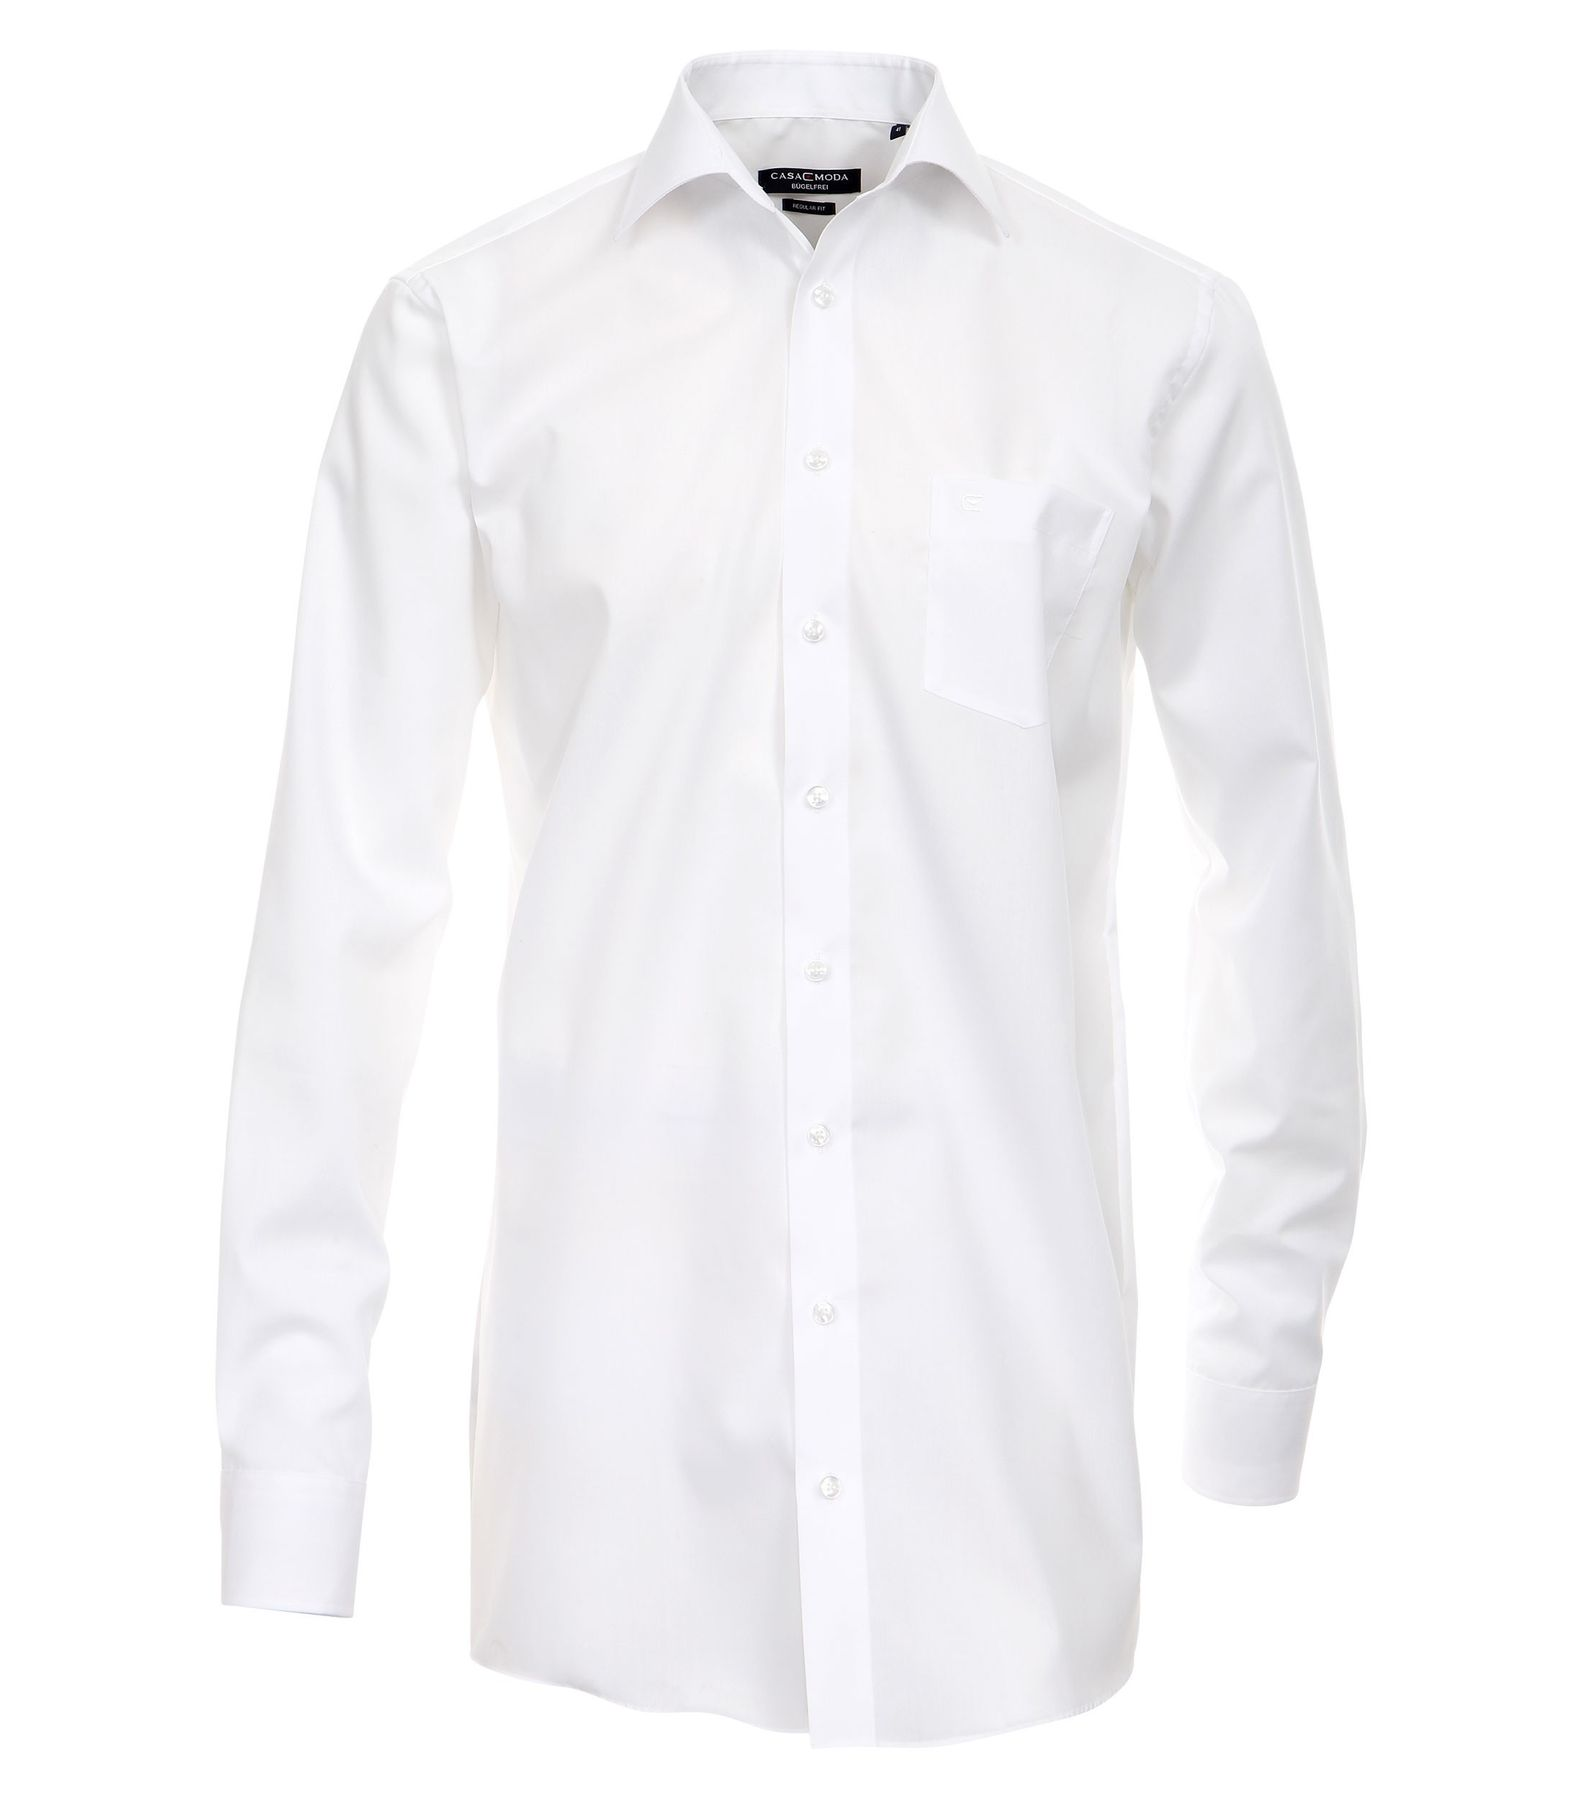 Casa Moda - Comfort Fit - Bügelfreies Herren Business Hemd mit Extra langem Arm (72cm) in verschiedenen Farben (006062) – Bild 1